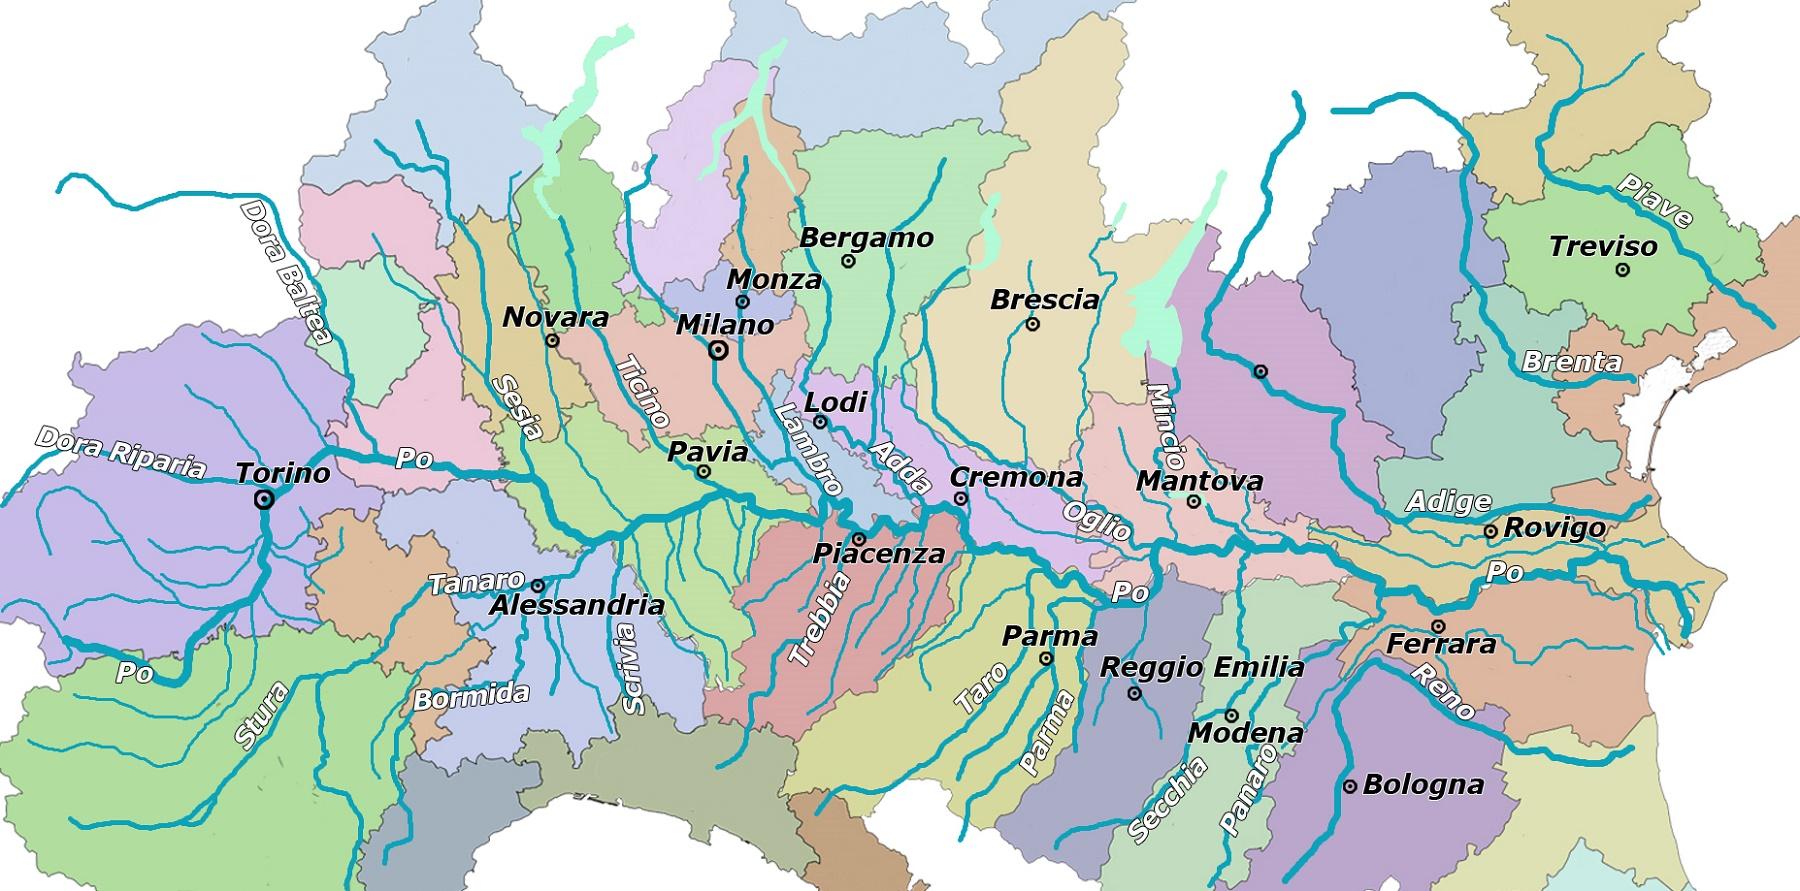 Bergamo Sulla Cartina Geografica.Pianura Padana Cartina Fisica E Cartina Politica Viaggi E Vacanze